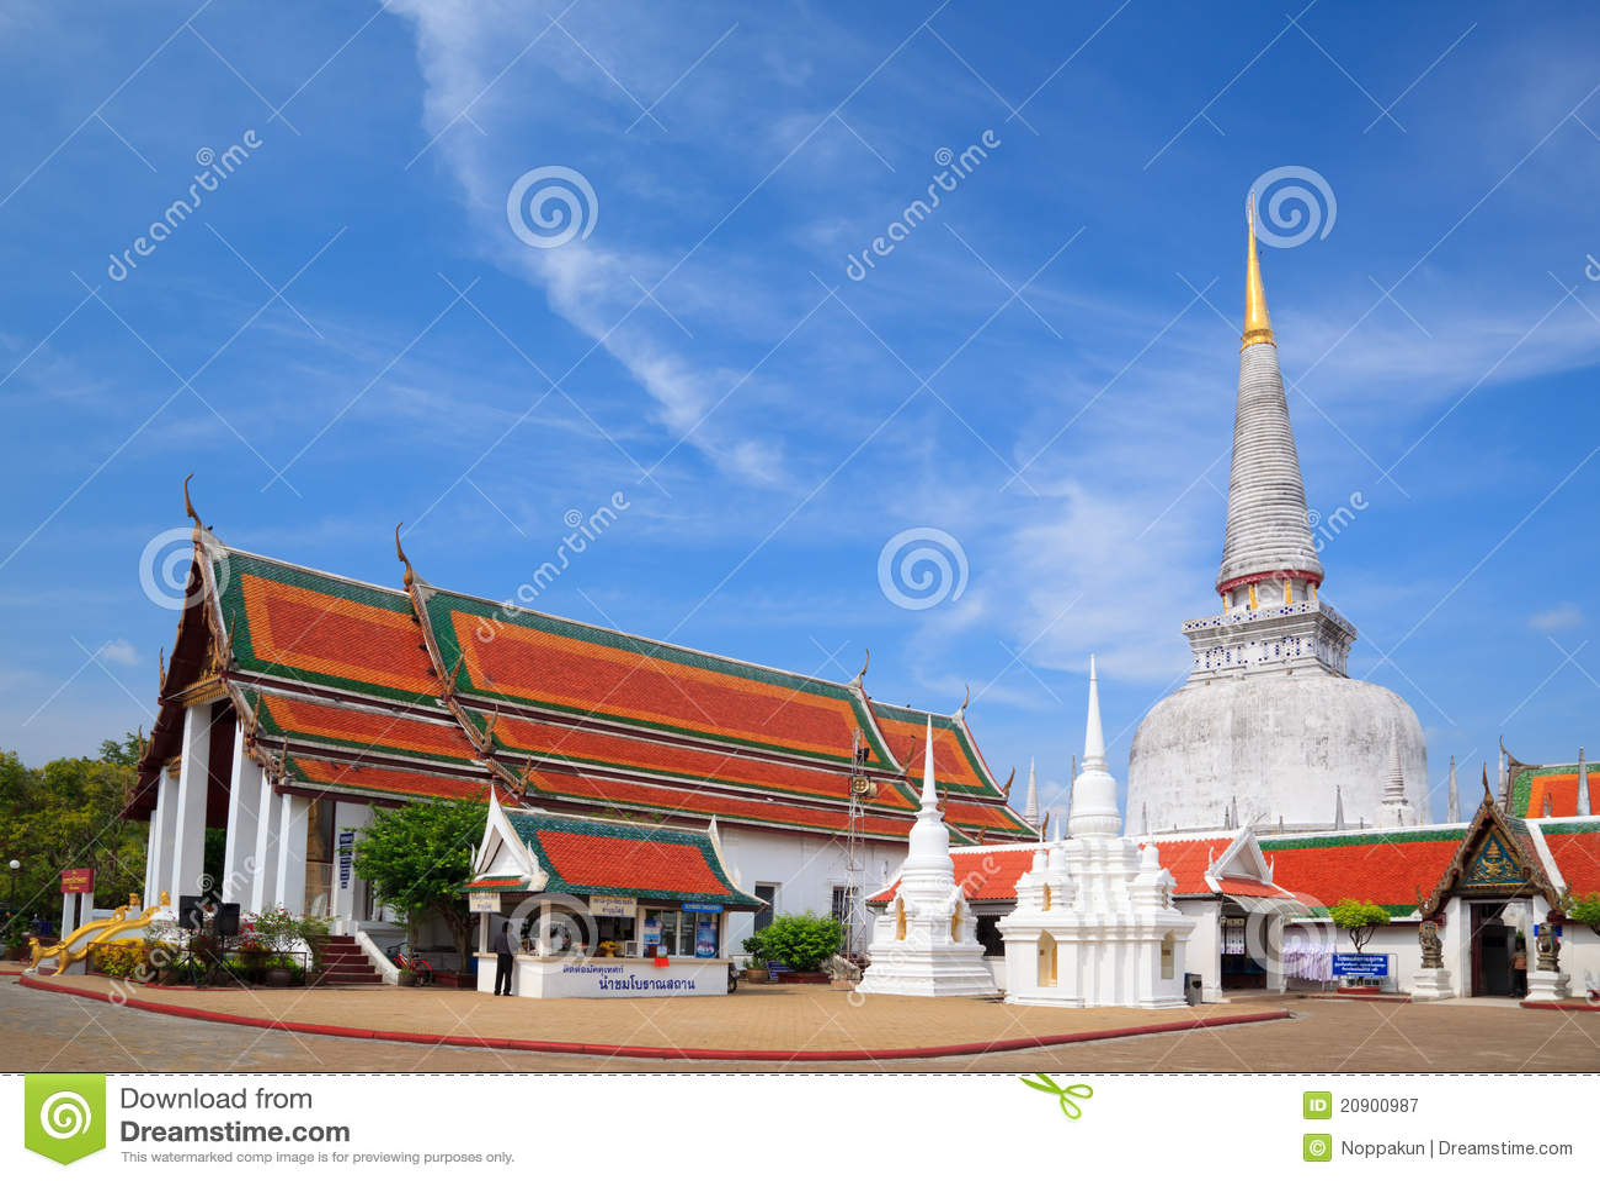 Ancient Pagoda   Nakhon Si Thammarat  Thailand Stock Image